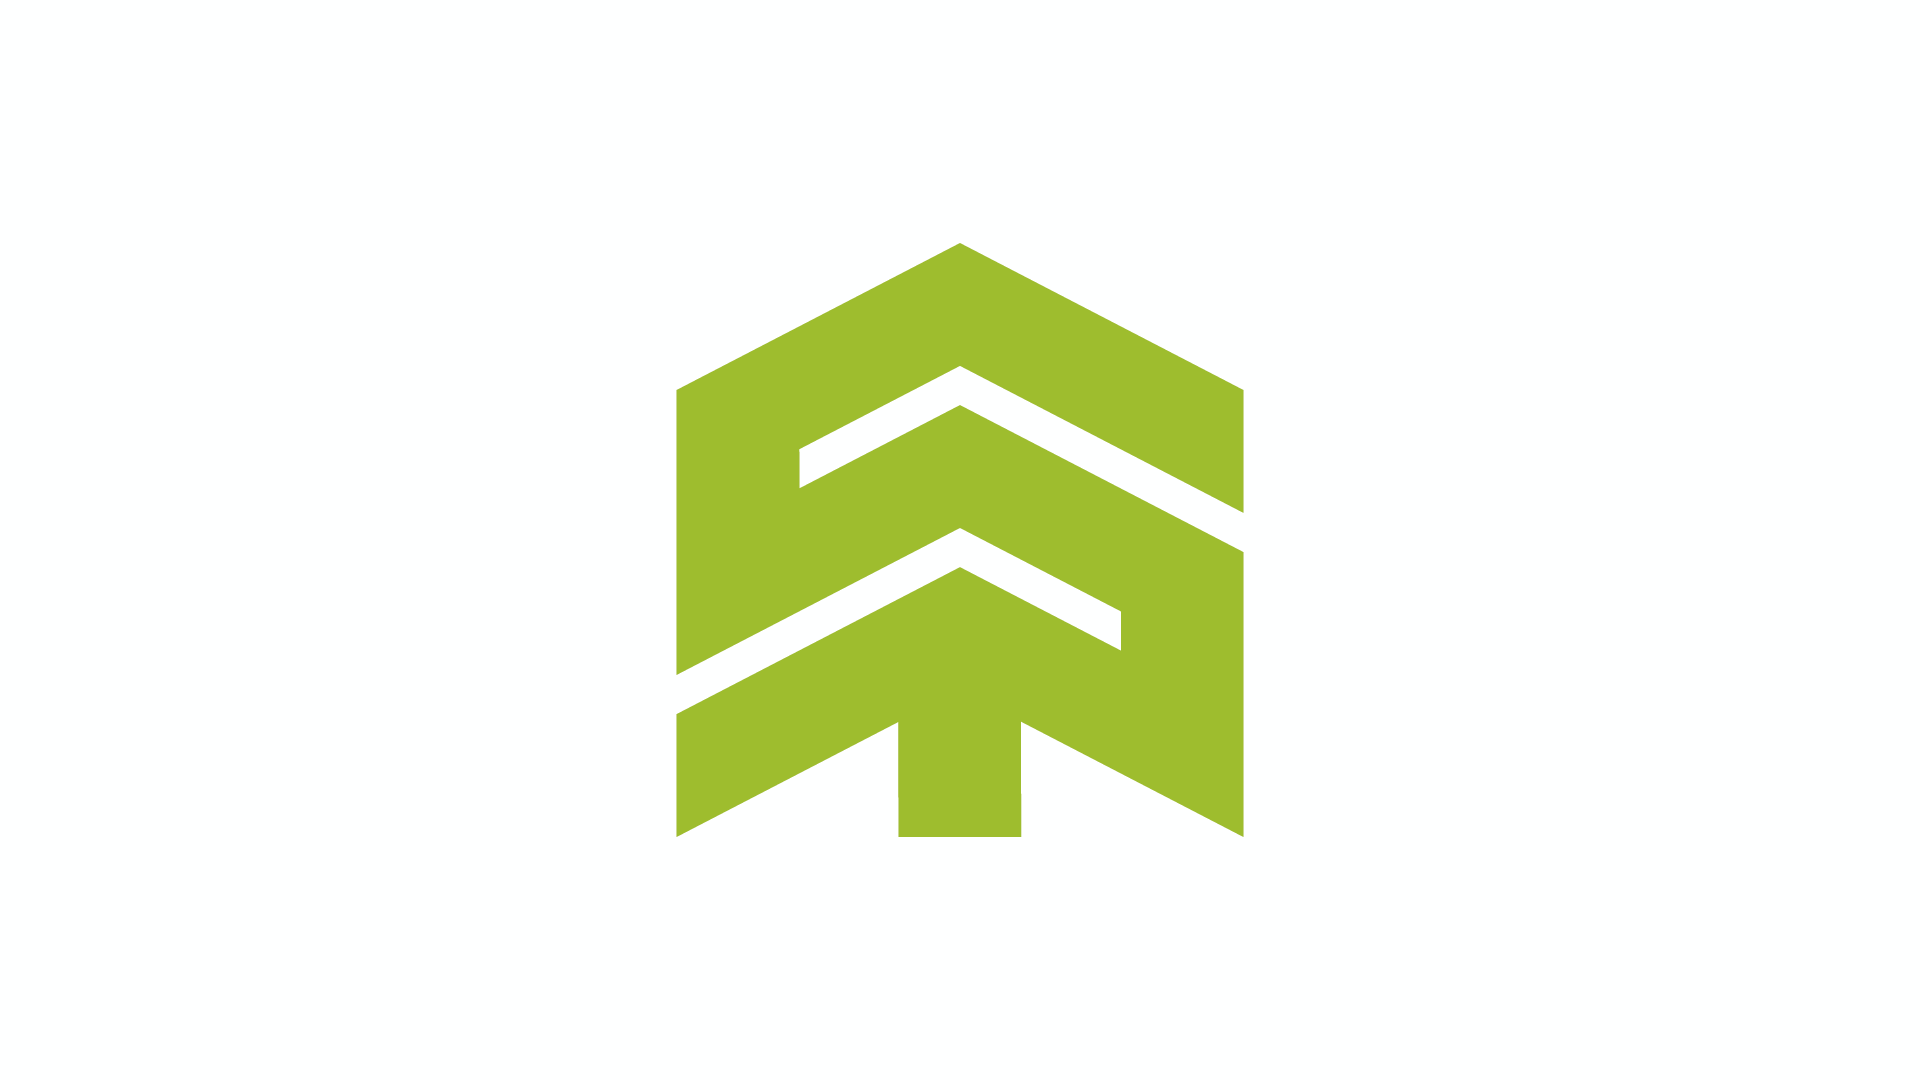 s_tree_logo.png